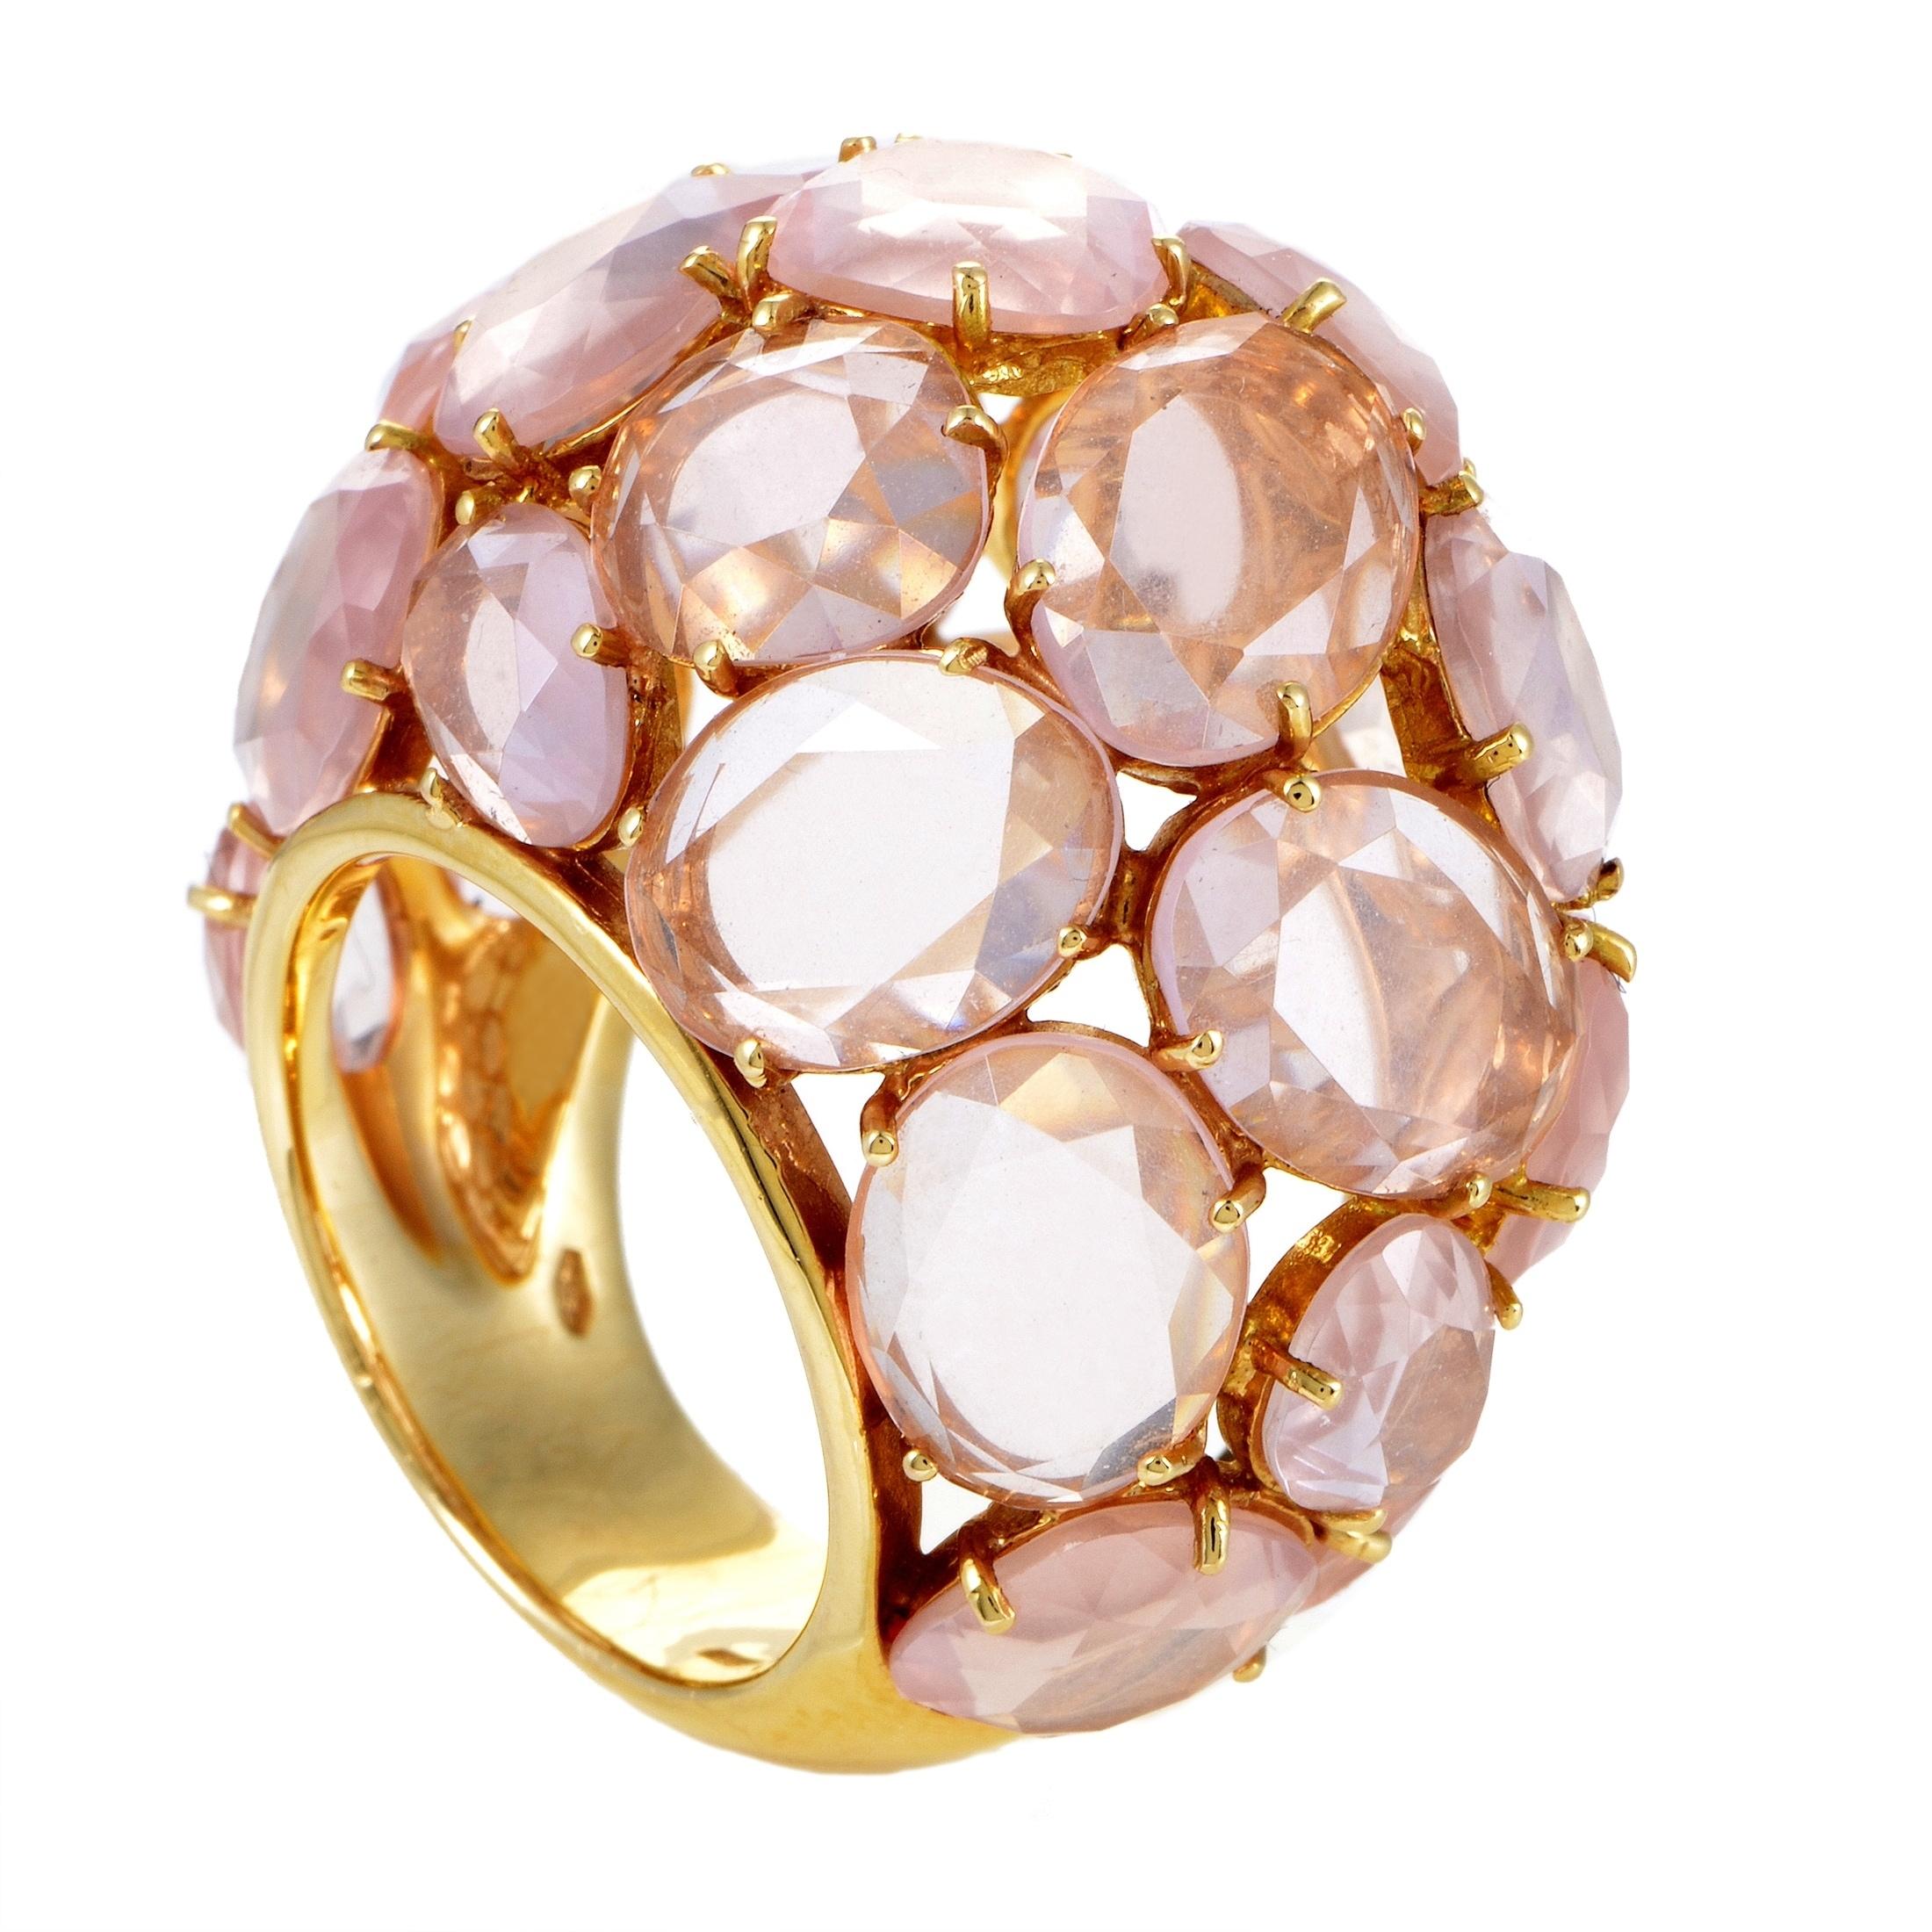 Bombe 94 pour pomellato capri women's yellow gold pink quartz bombe ring - free